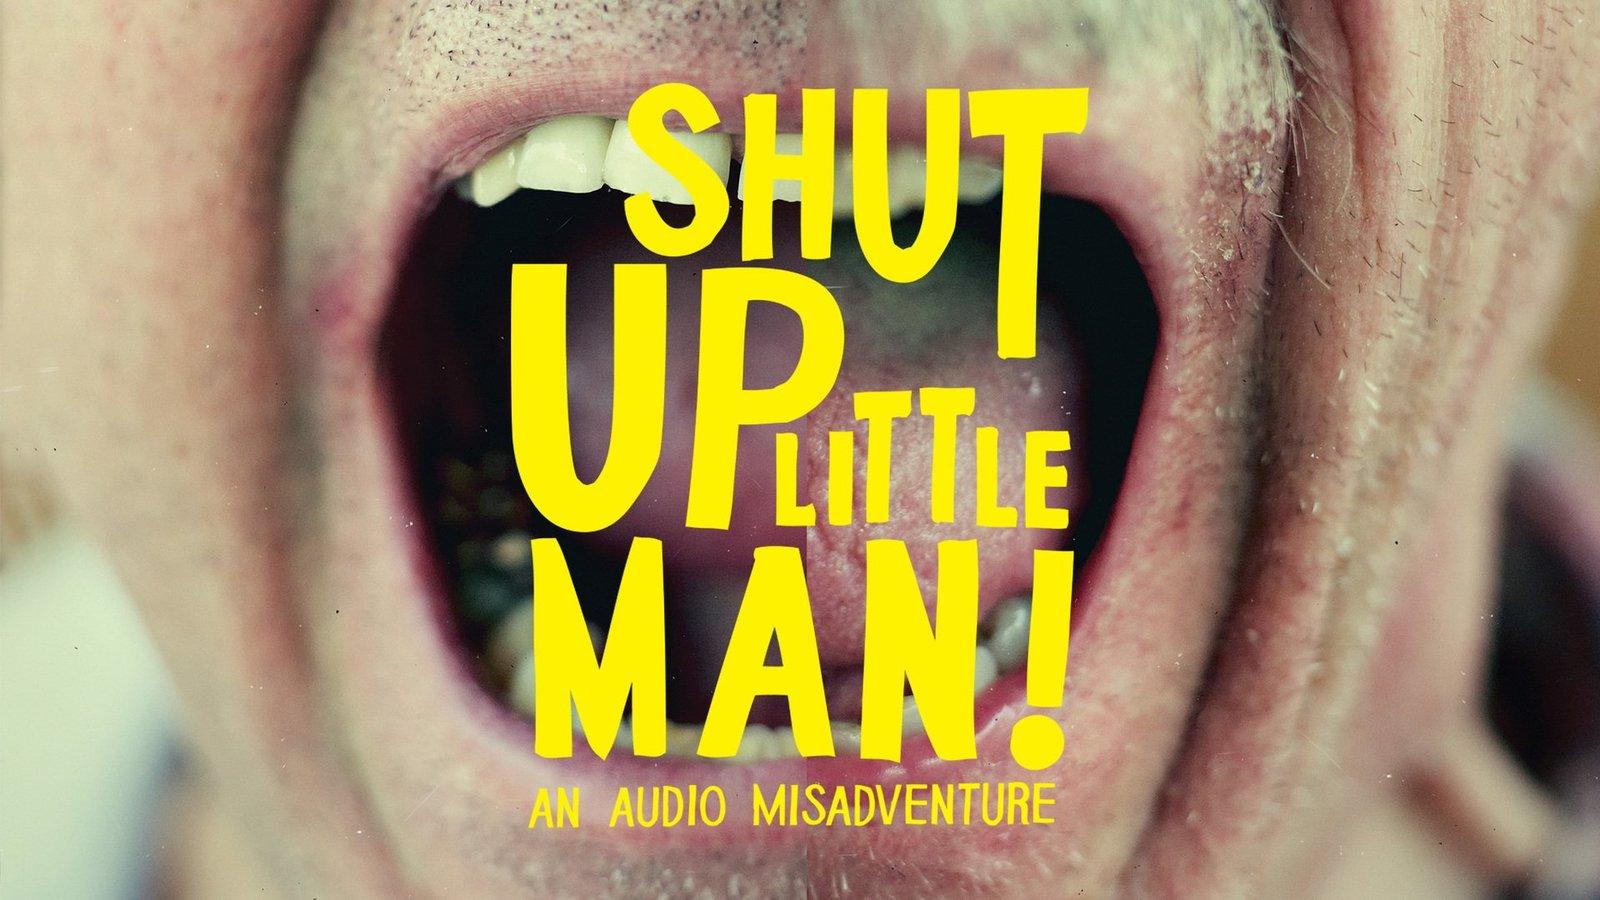 Shut Up Little Man - An Audio Misadventure